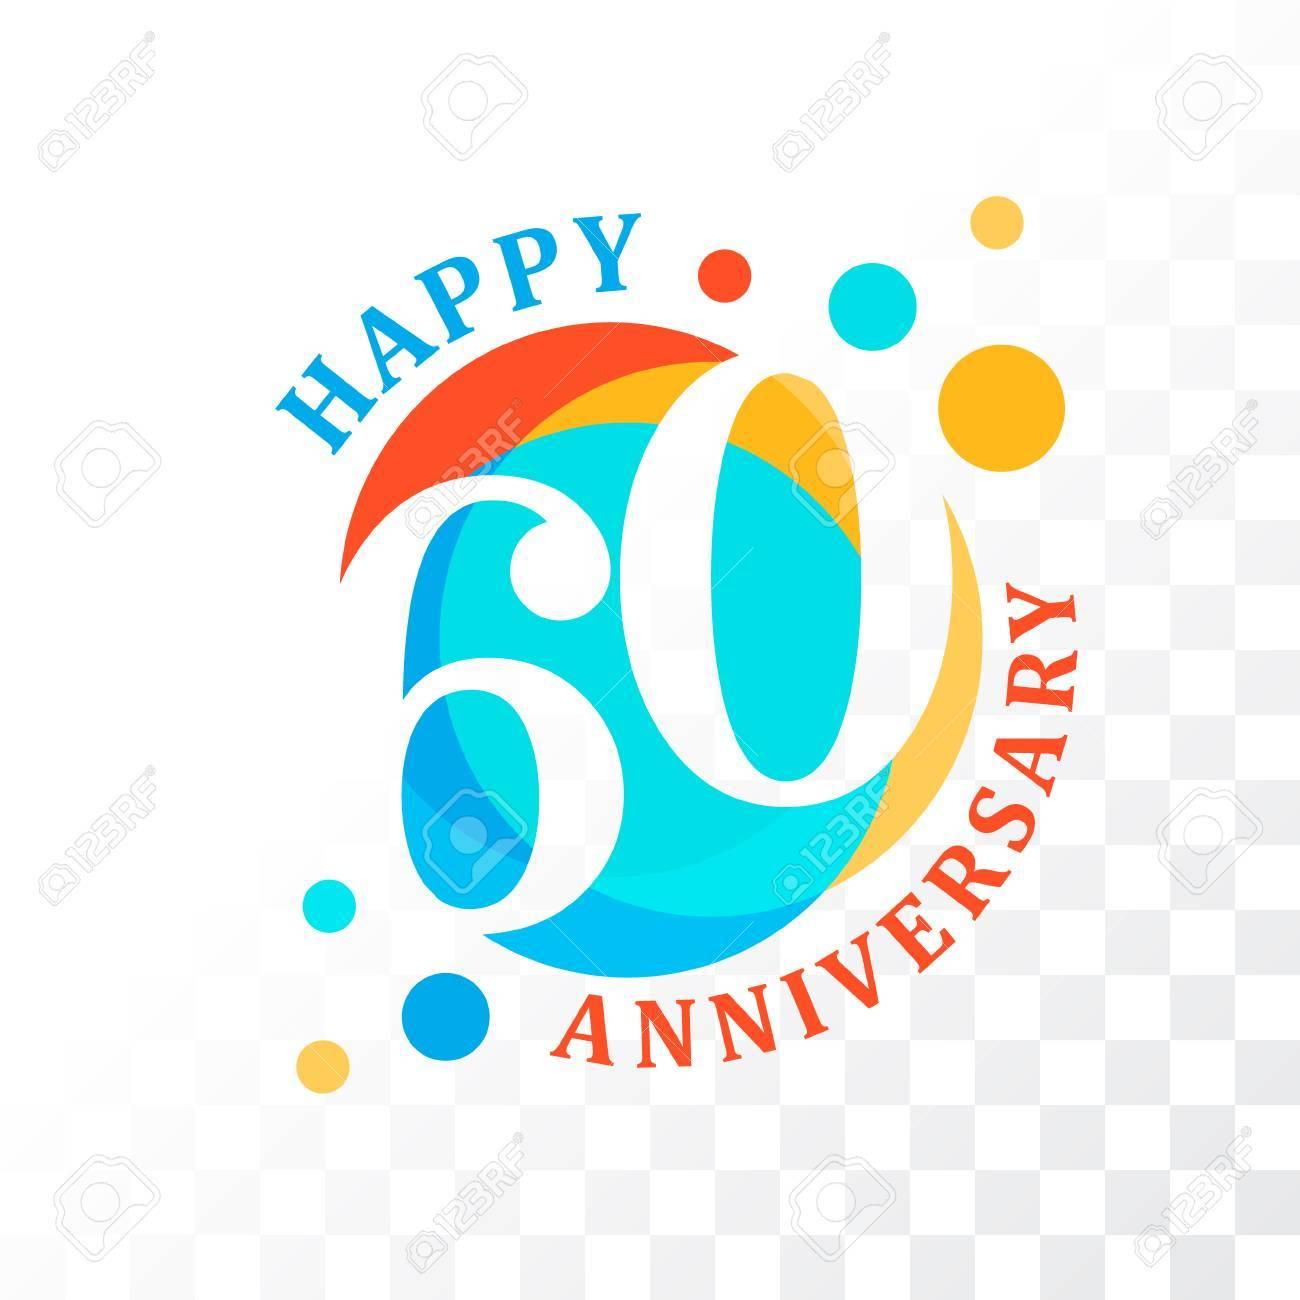 60th Anniversary emblem - 66211027